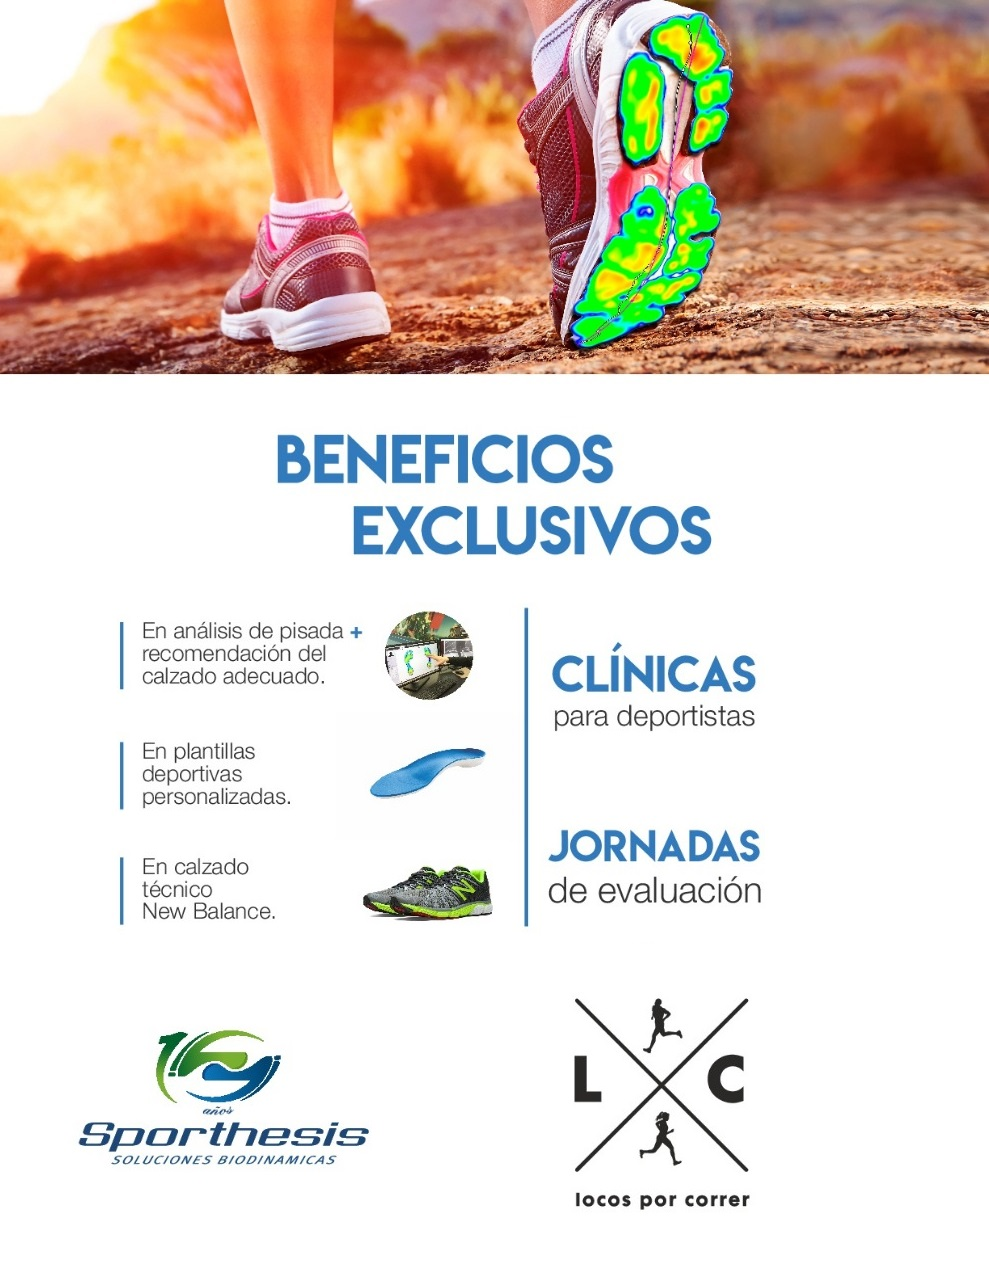 Sporthesis Locos Por Correr 01